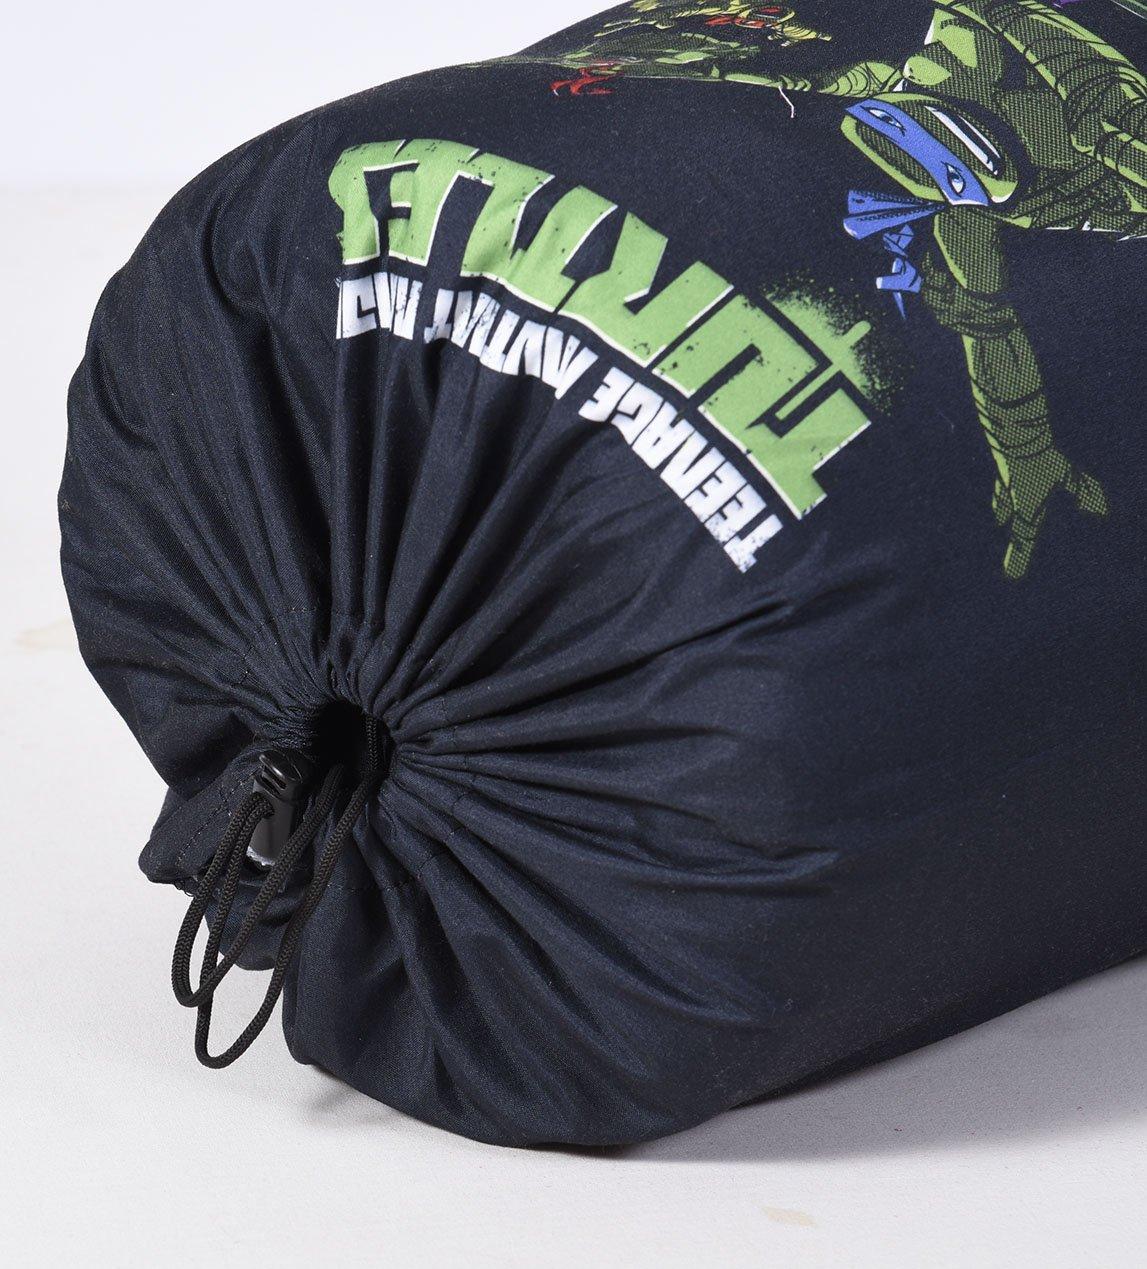 Cambay Linens Nickelodeon Kids Teenage Mutant Ninja Turtles Sleeping Bag Storage Bag, Black by Cambay Linens (Image #1)